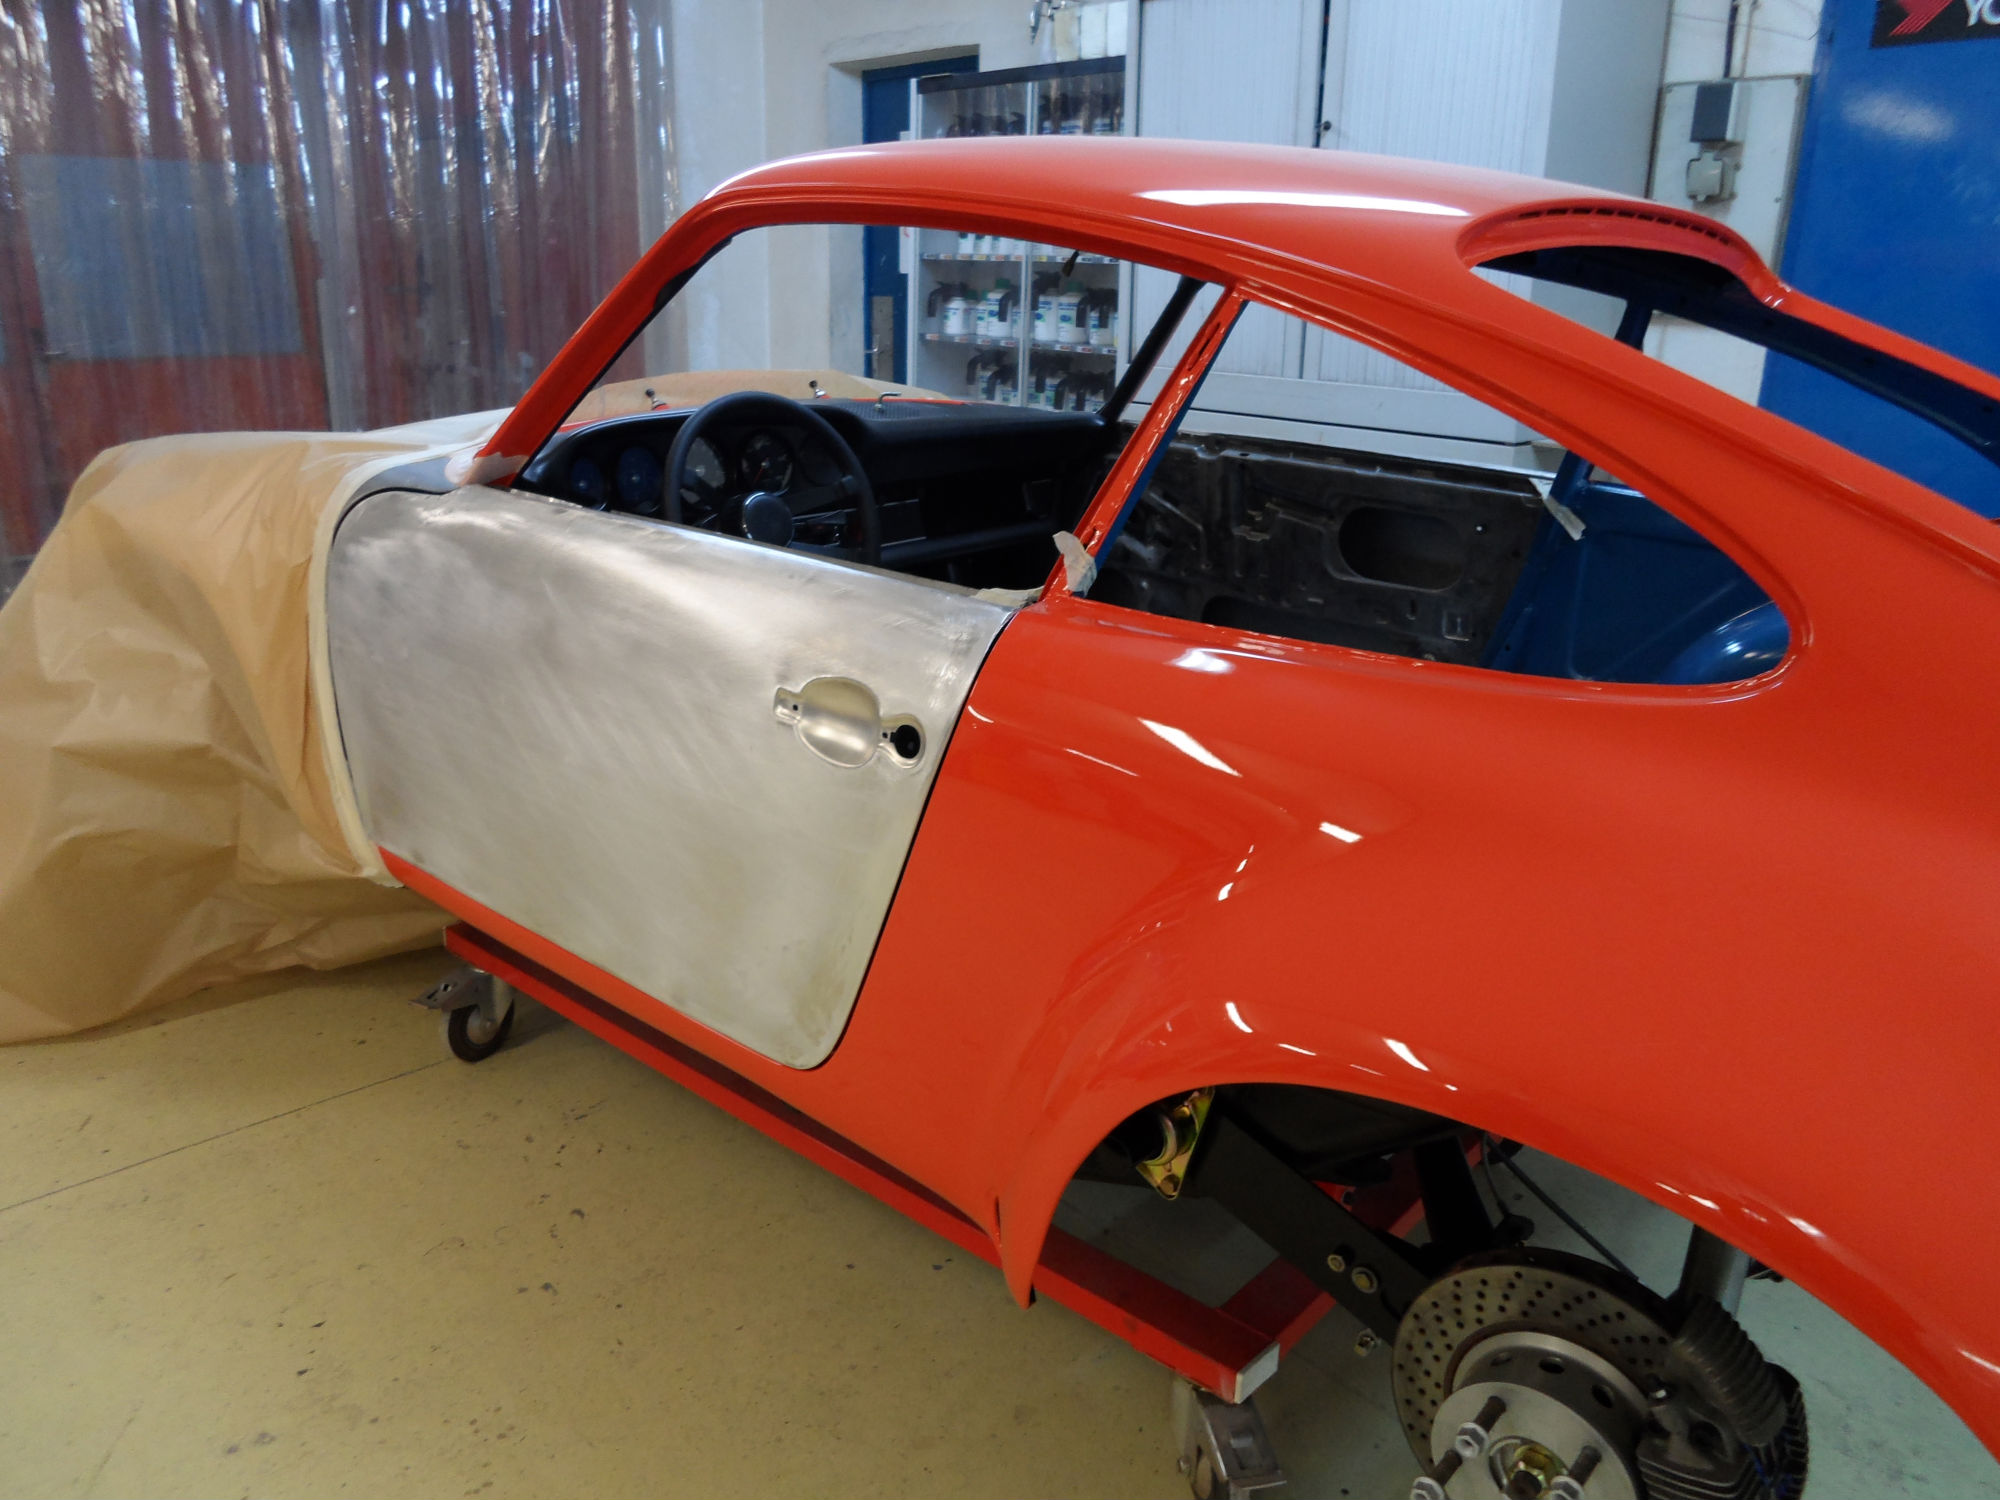 Garage bourgoin sp cialiste porsche equipements pont for Garage auto bourgoin